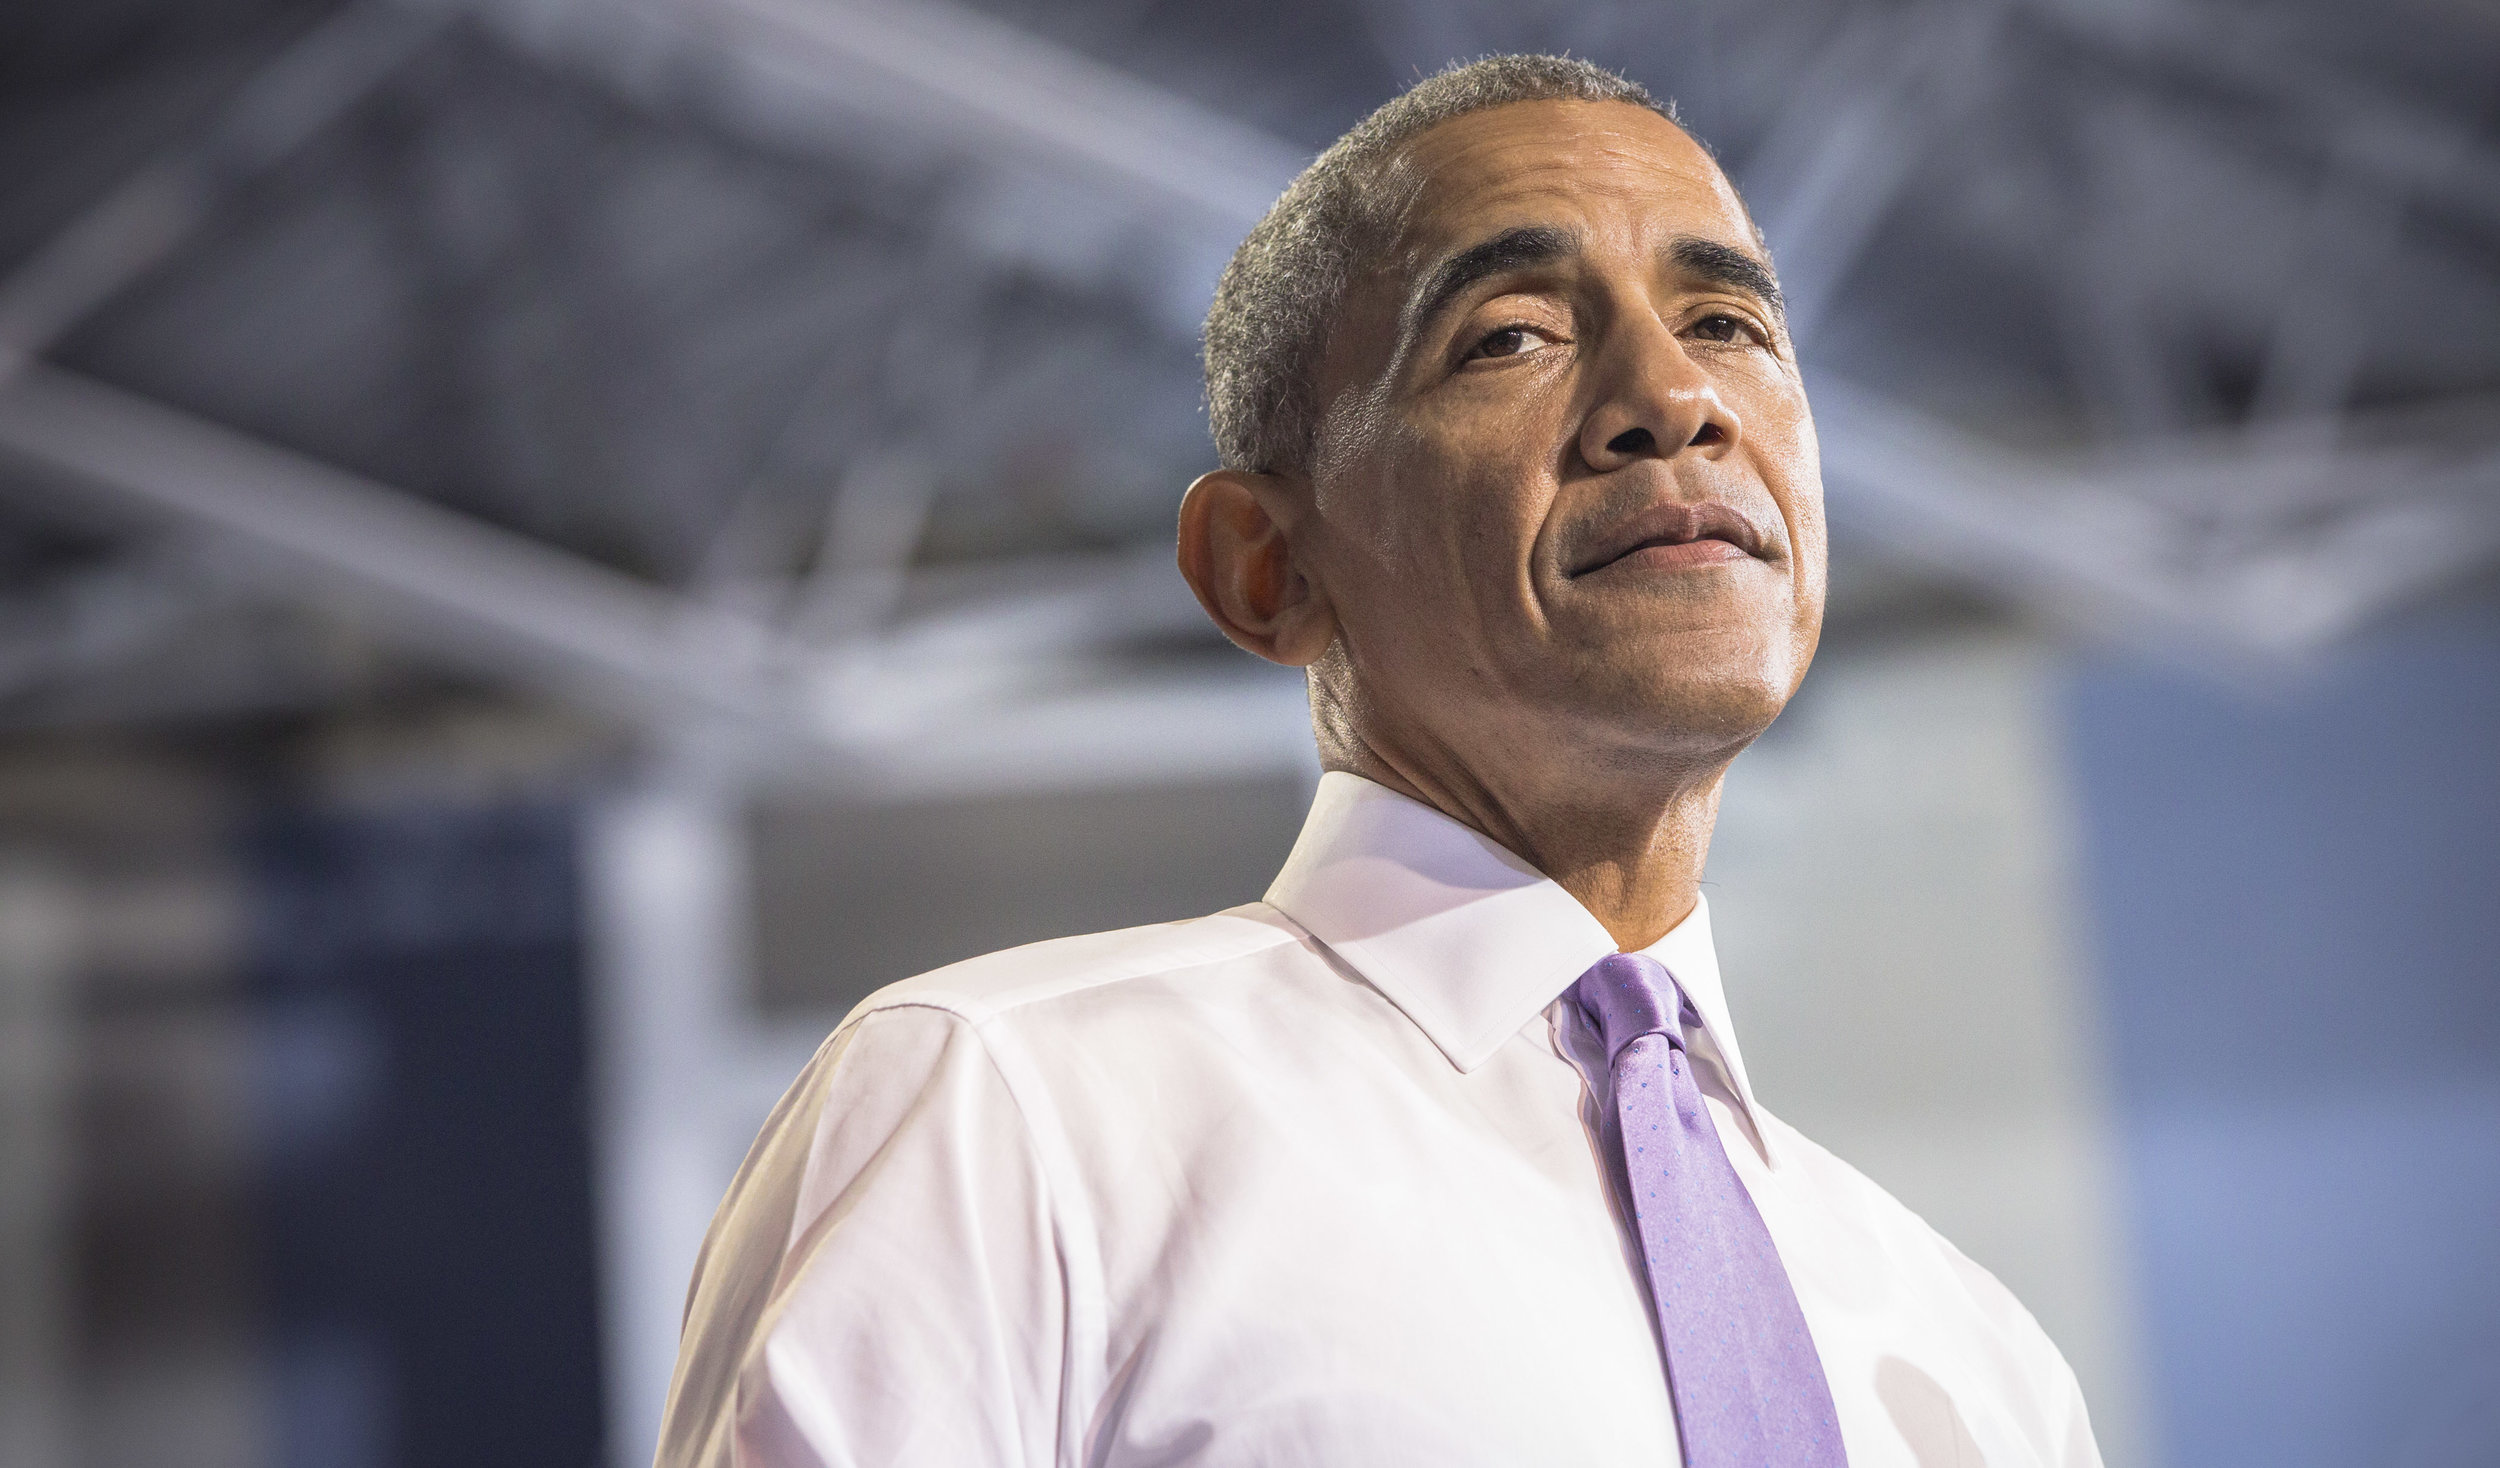 10202016_BJM_Barack_Obama_Campaigns_in_Miami_Florida_03.jpg